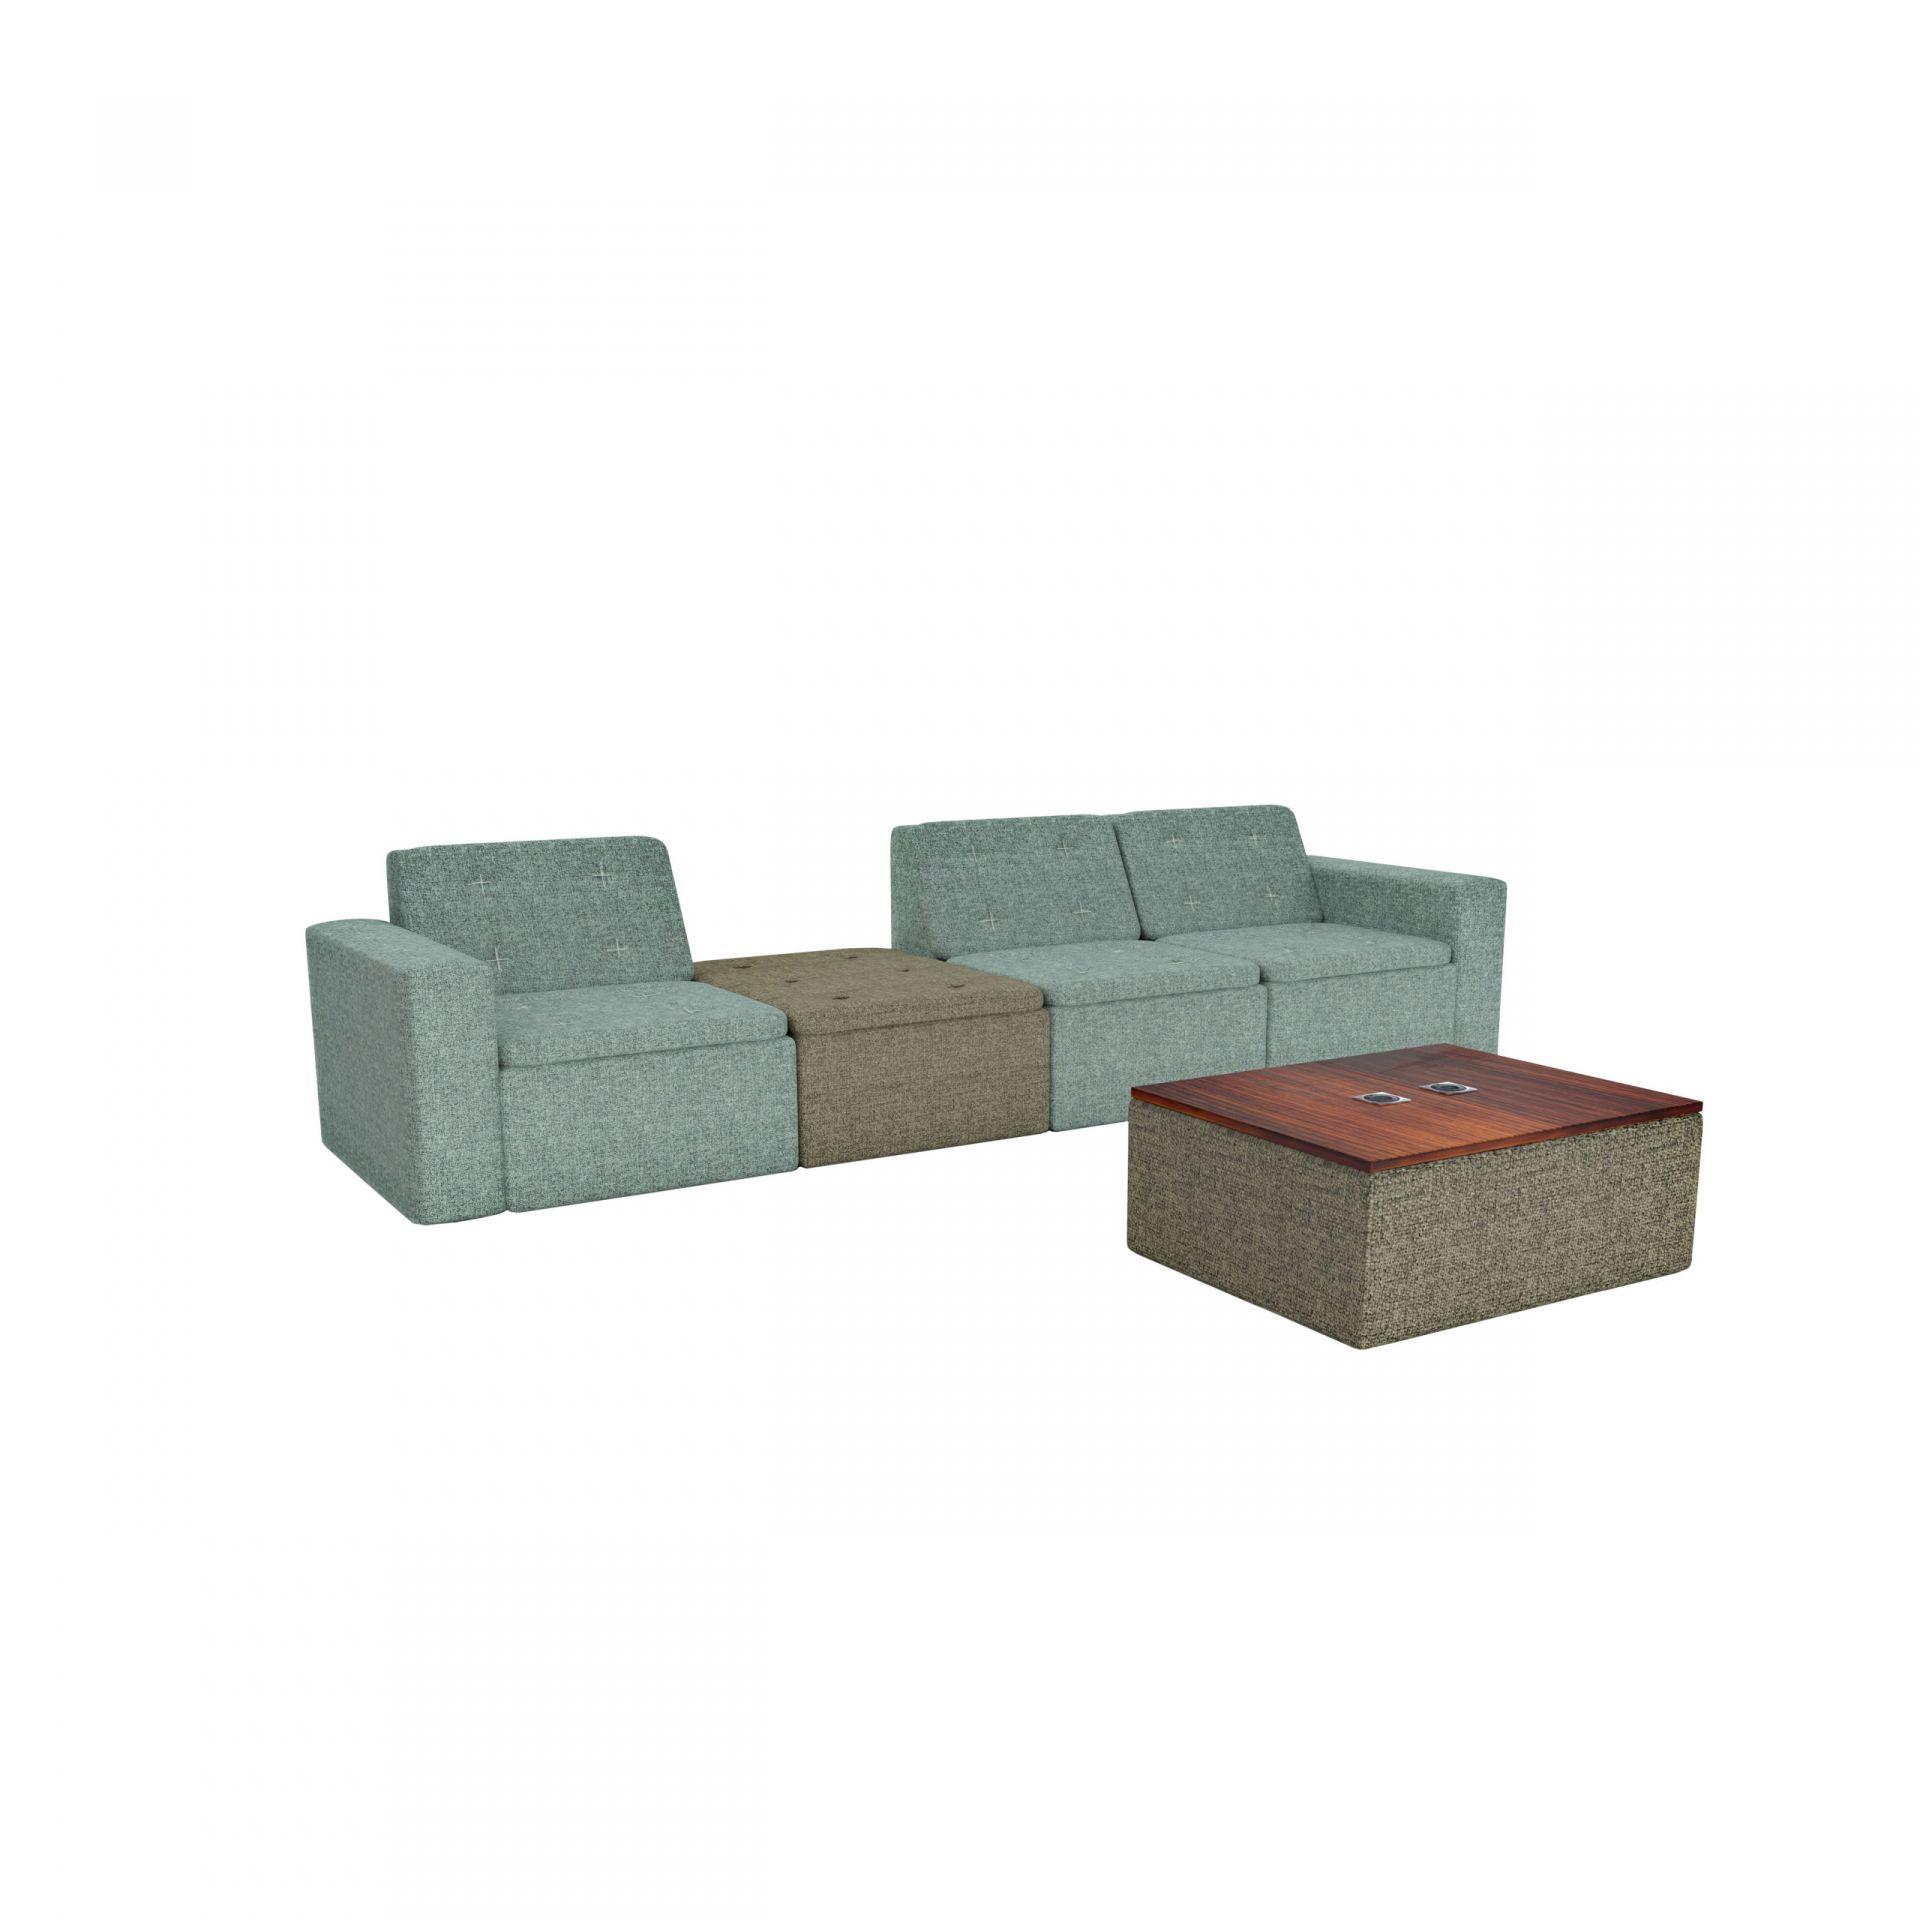 Hippione Modular sofa product image 1